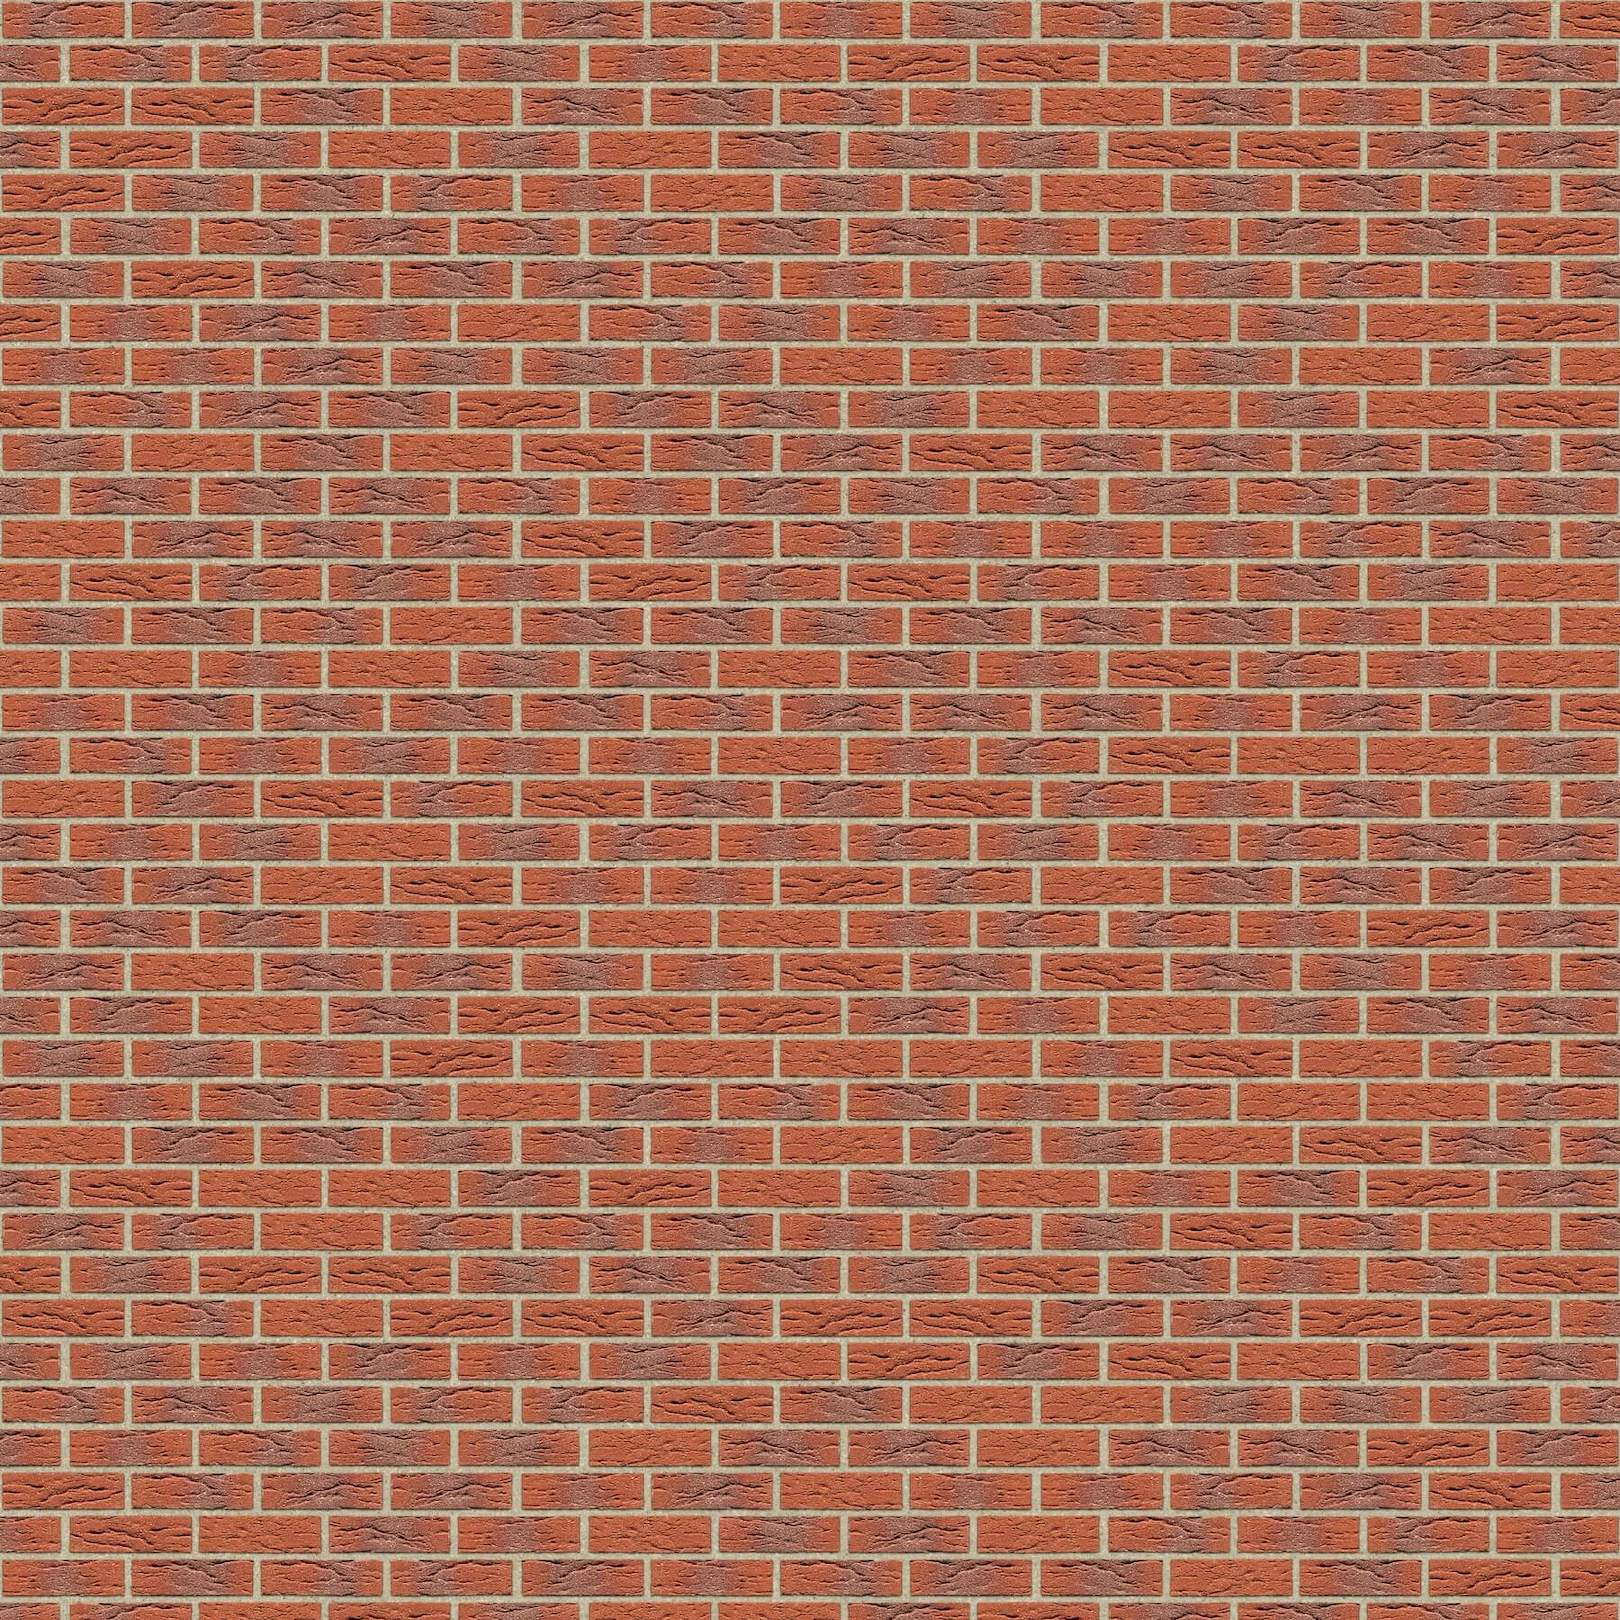 Puna-cigla-Feldhaus-Klinker-brick-house-nf-k-345-Bez Fuga